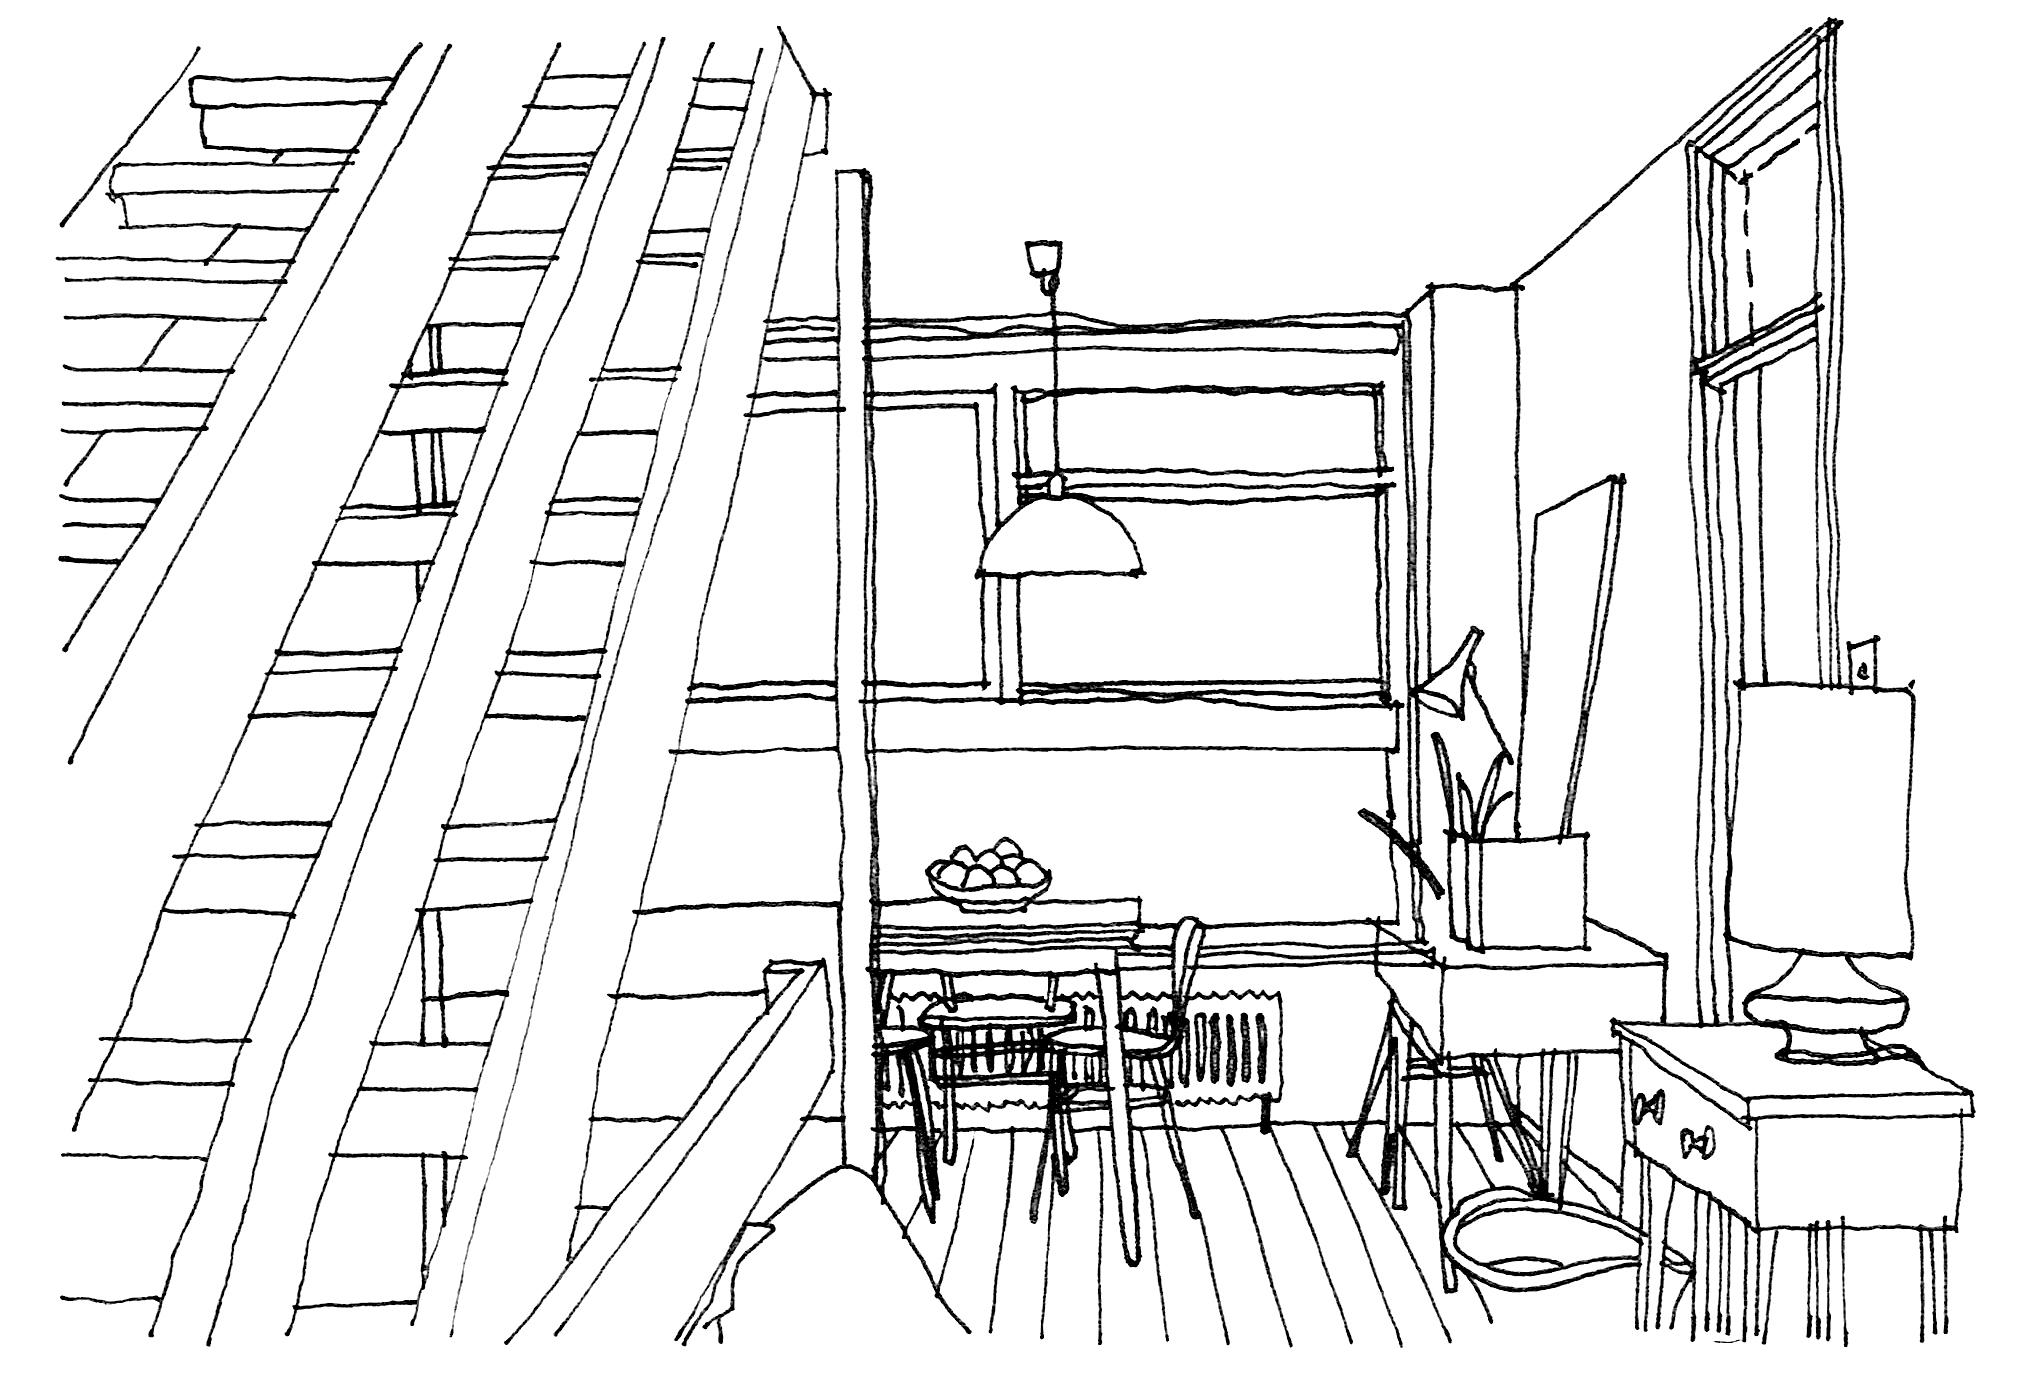 Stage 1: Concept design - Measured survey, desktop research, brief development, design proposals based on your brief